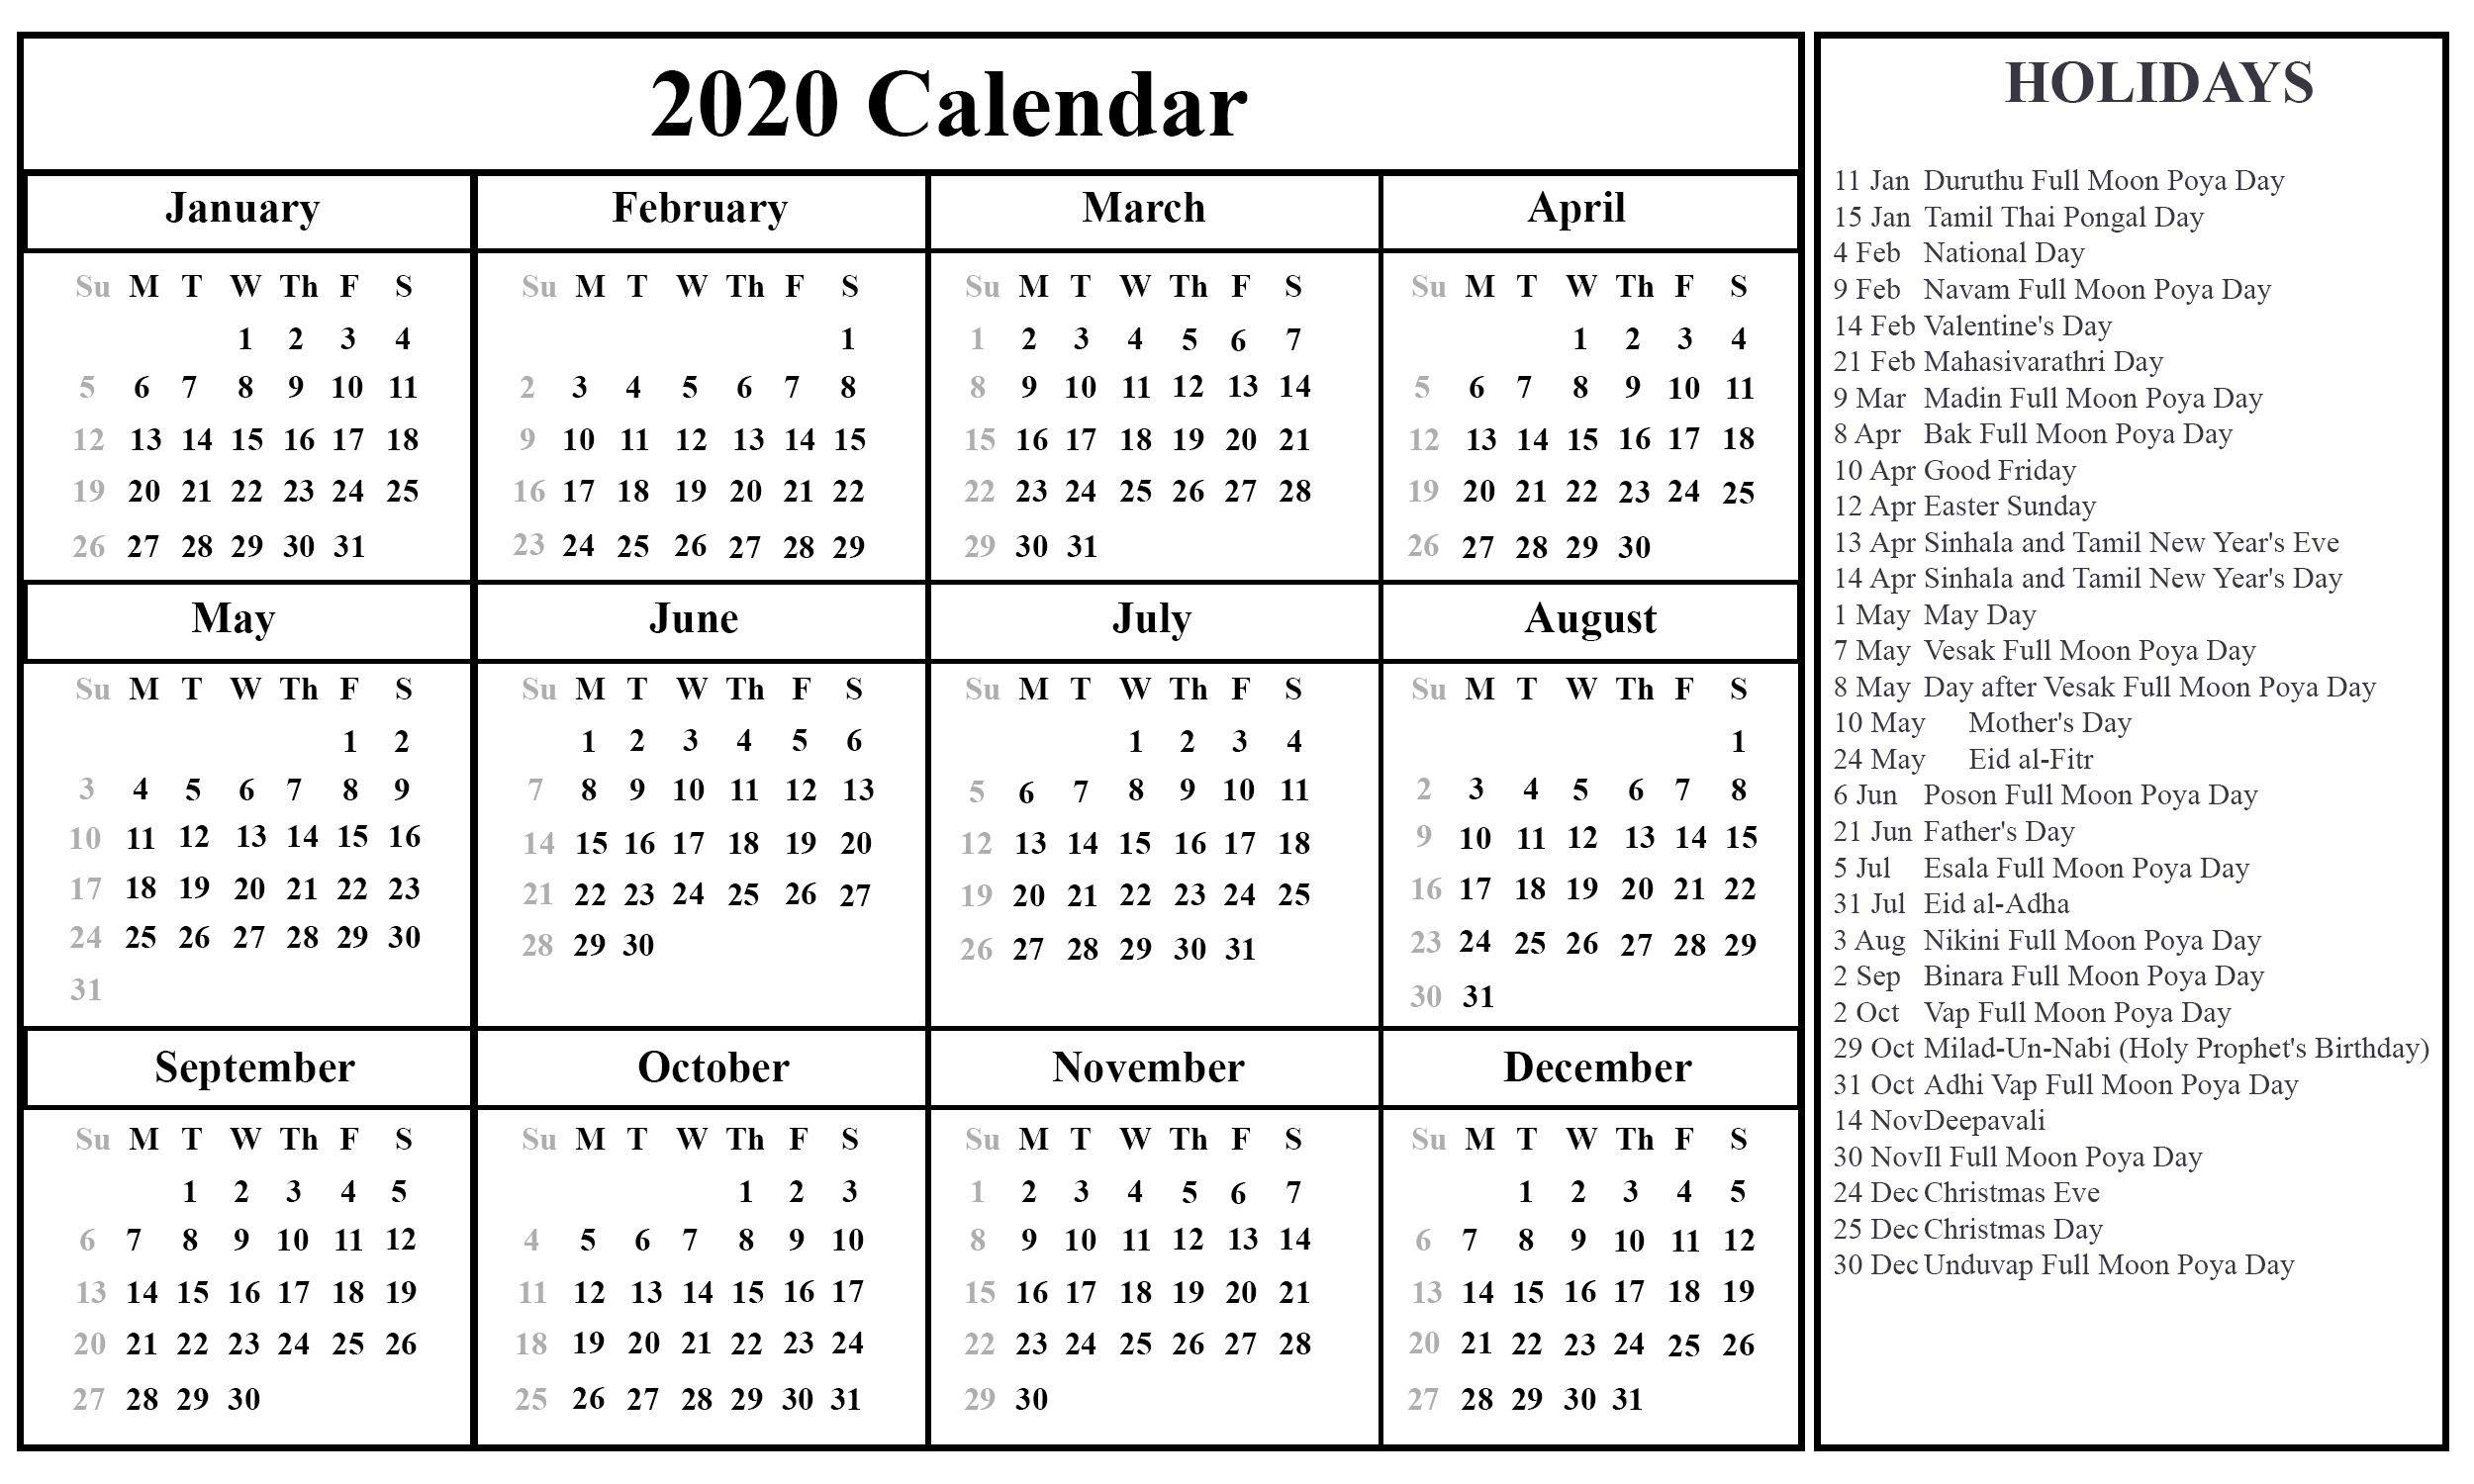 2021 Calendar Sri Lanka With Holidays | Printable-Mercantil Holidays For 2021 Sri Lanka